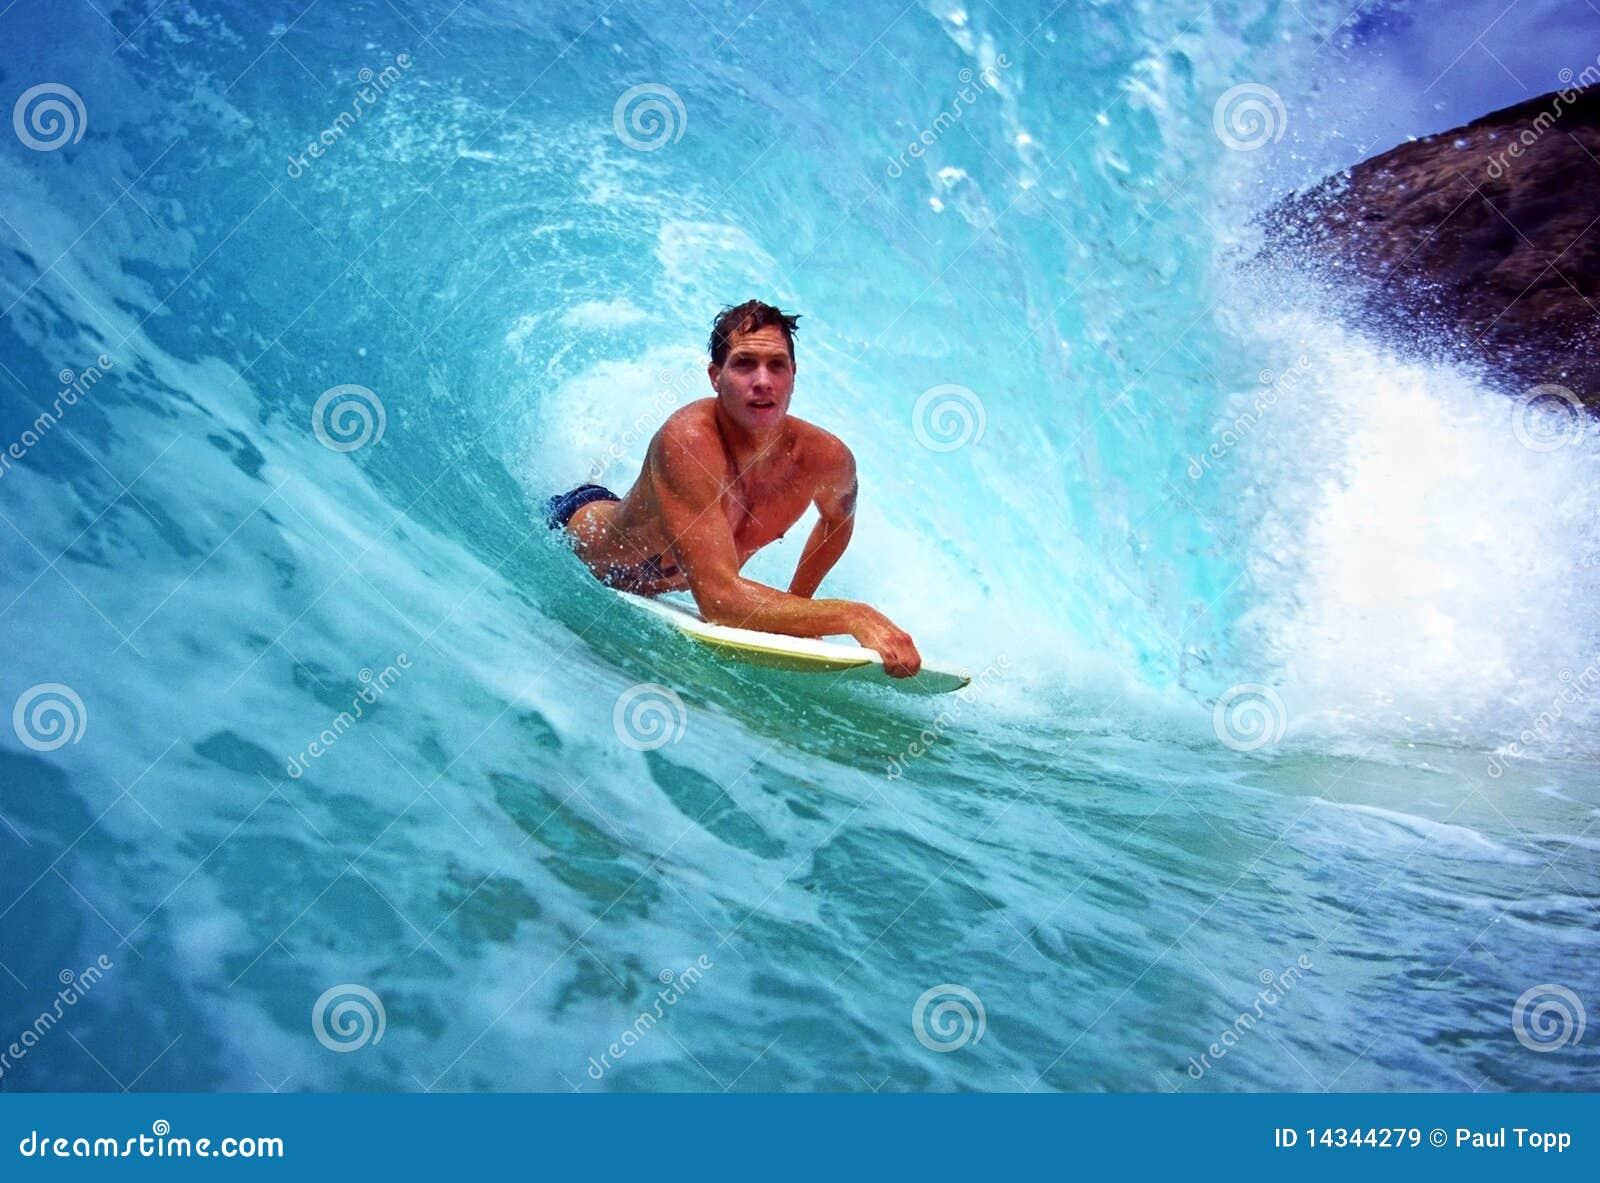 Bodyboarder Chris Gagnon Surfing in Hawaï